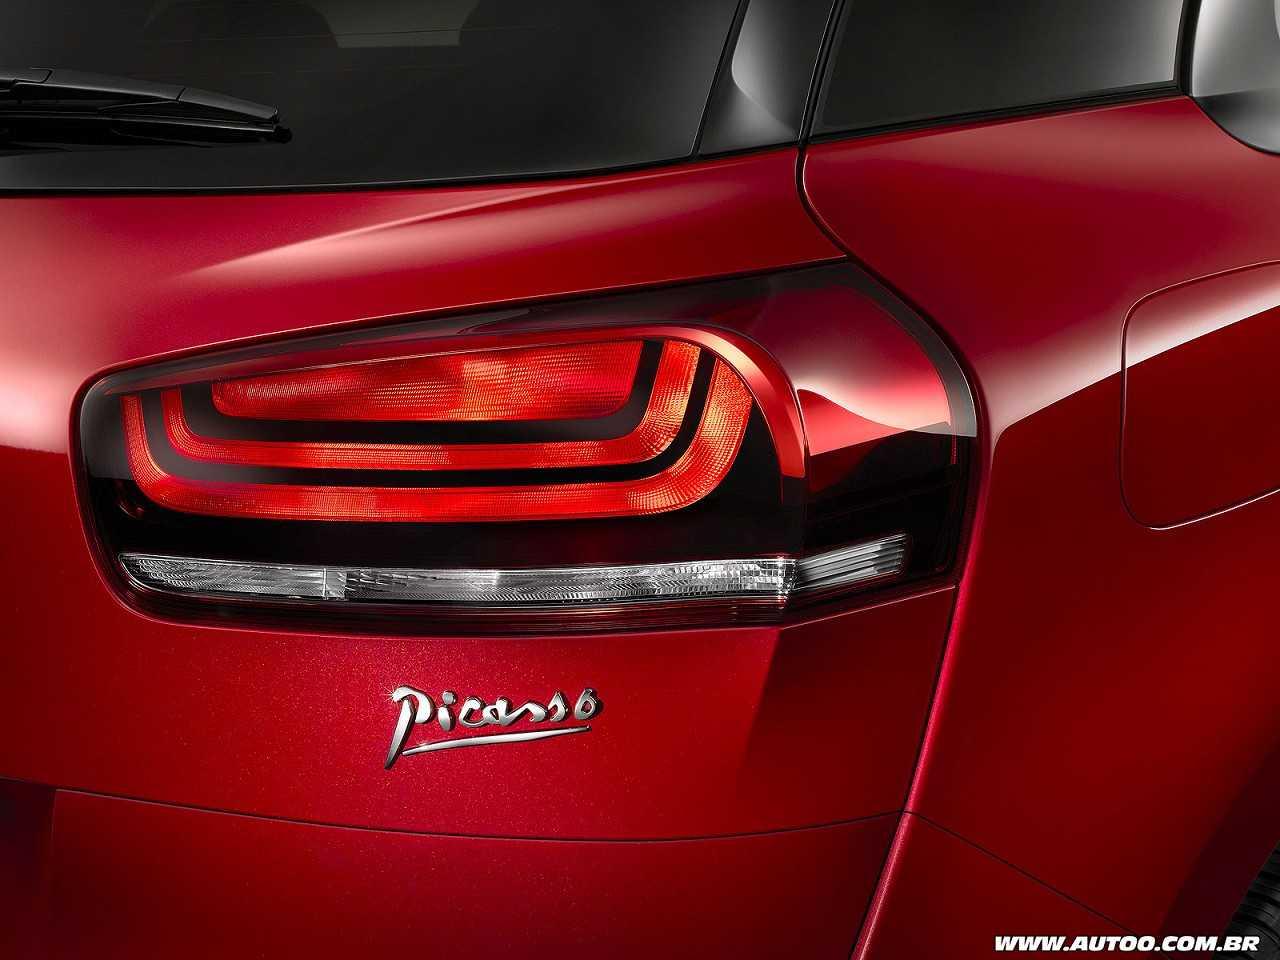 CitroënC4 Picasso 2018 - lanternas